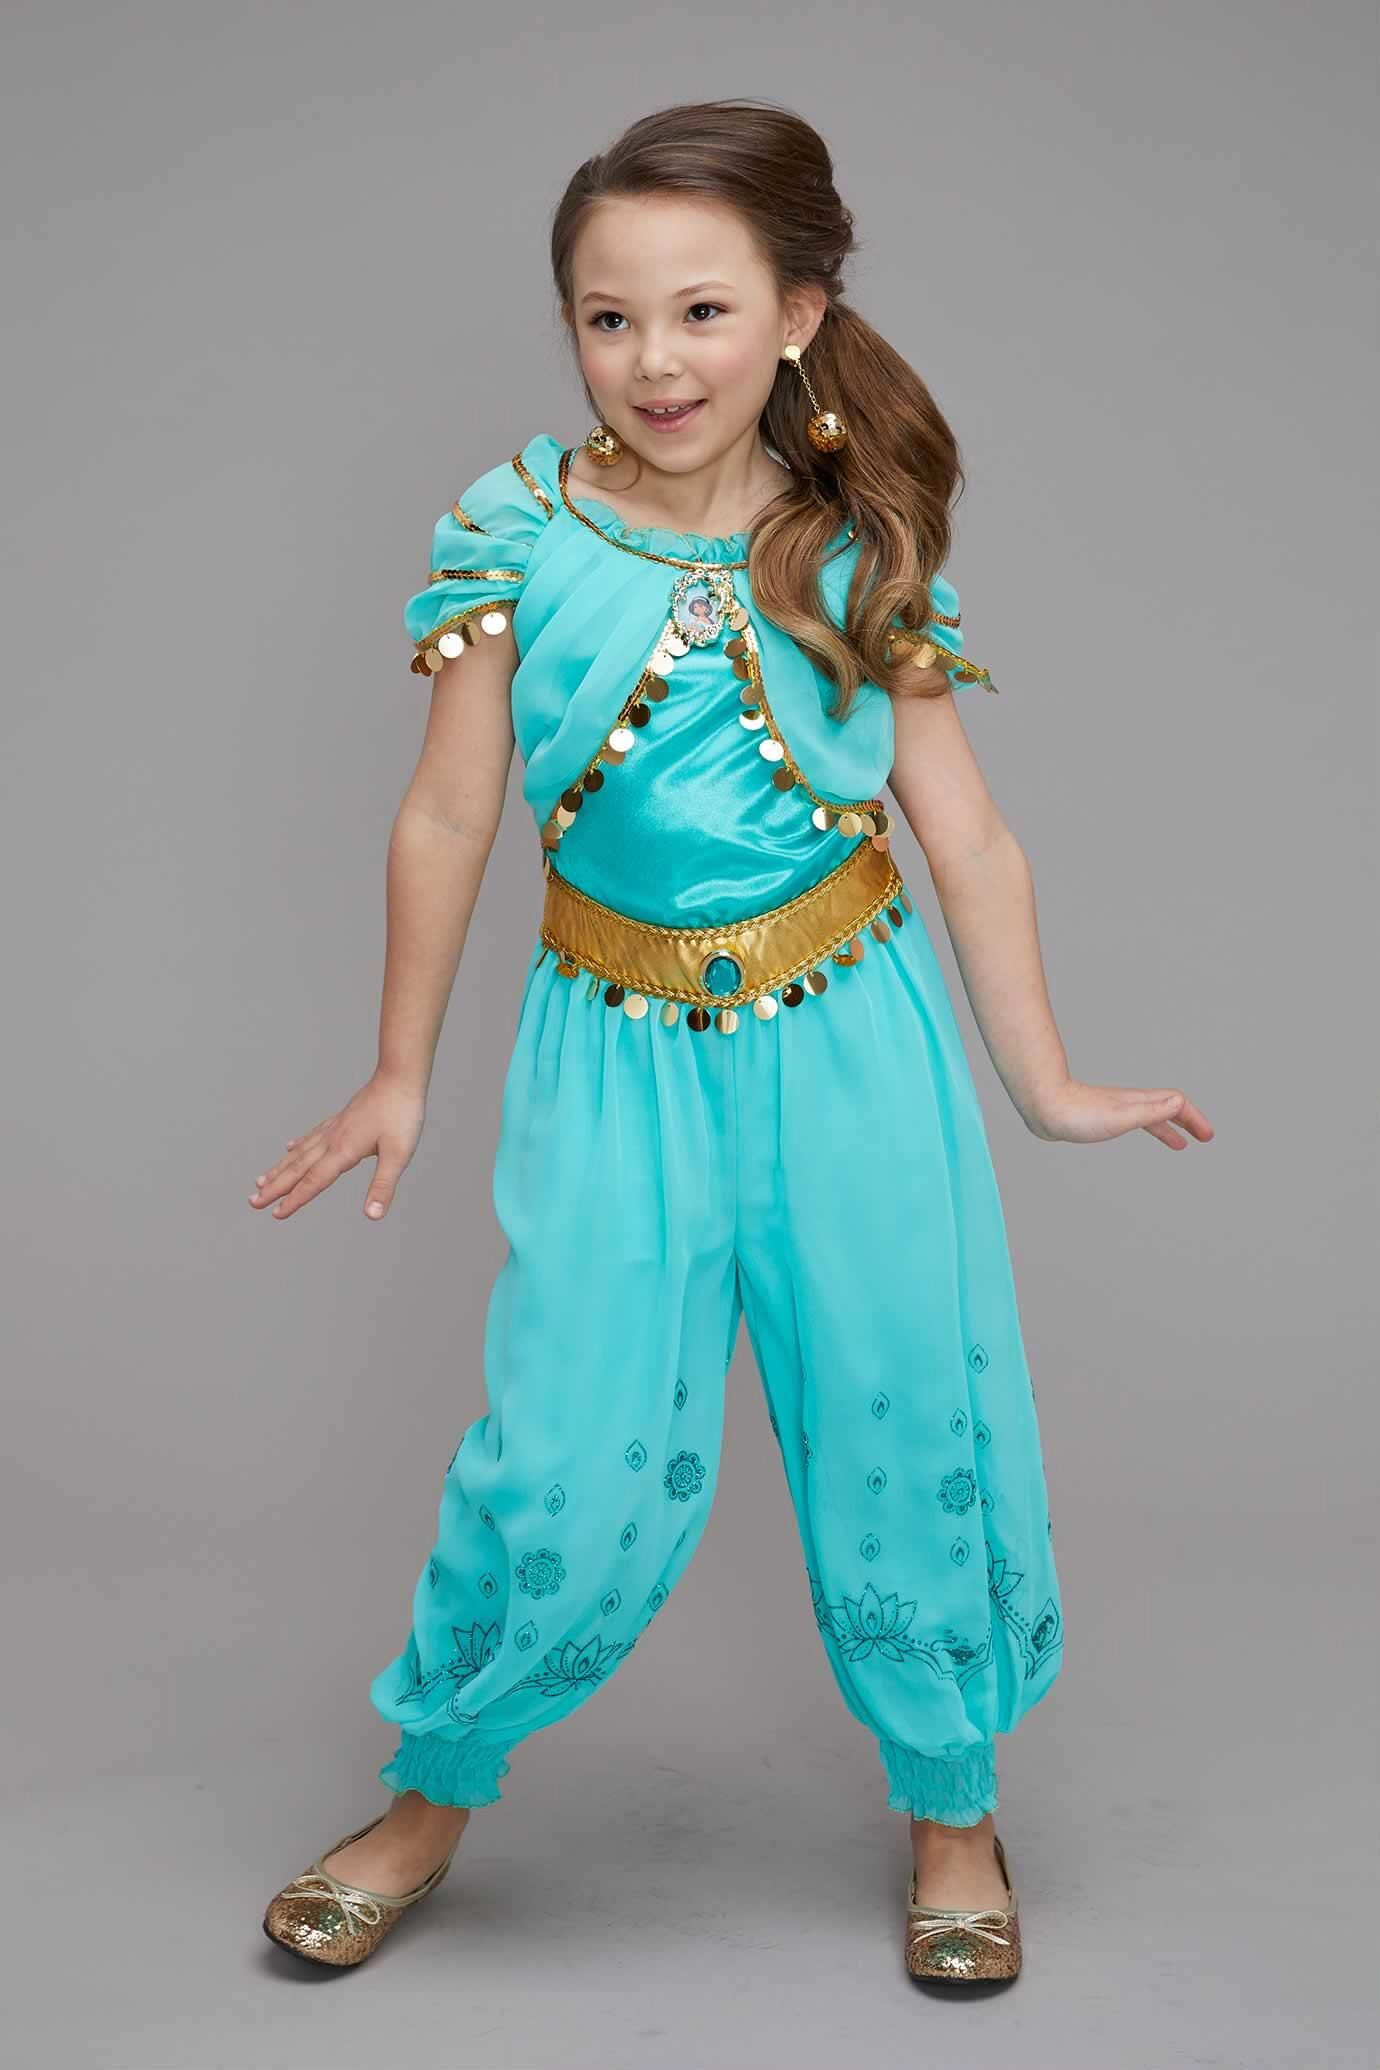 World Book Day-Aladdin-Genie NEW PRINCESS JASMINE Child/'s Costume All Ages